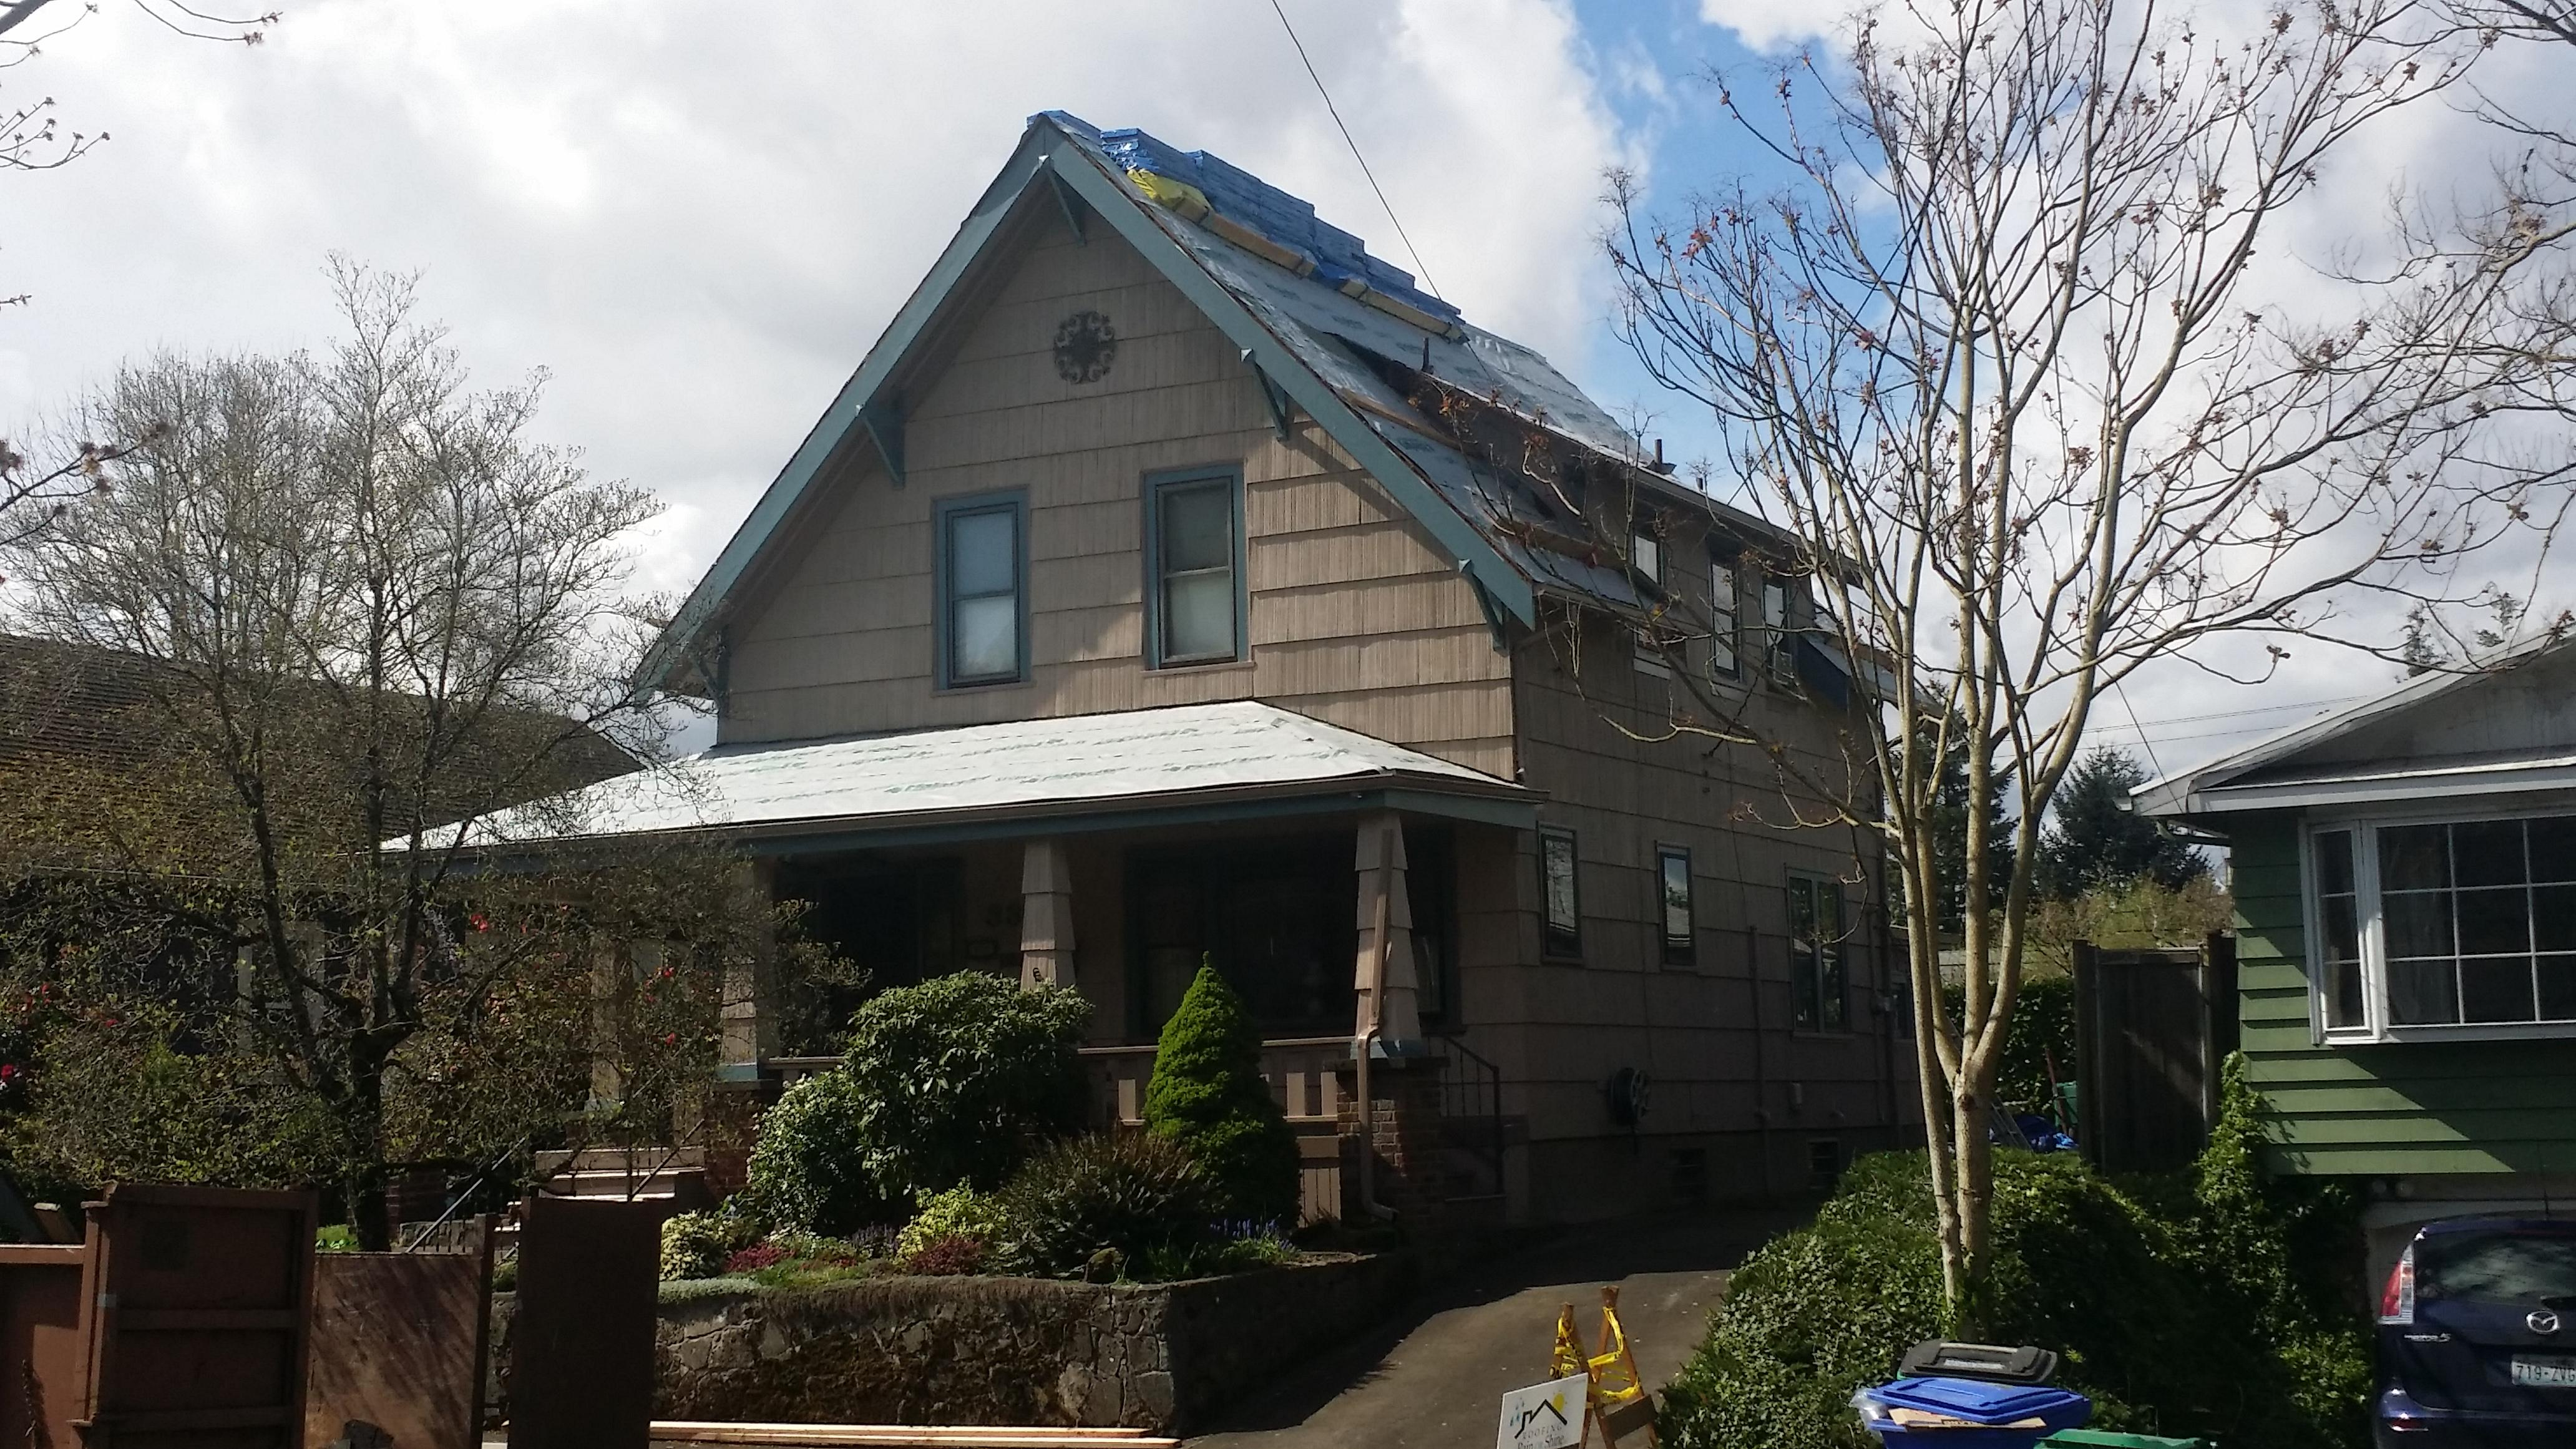 Roofing Rain OR Shine, LLC image 4